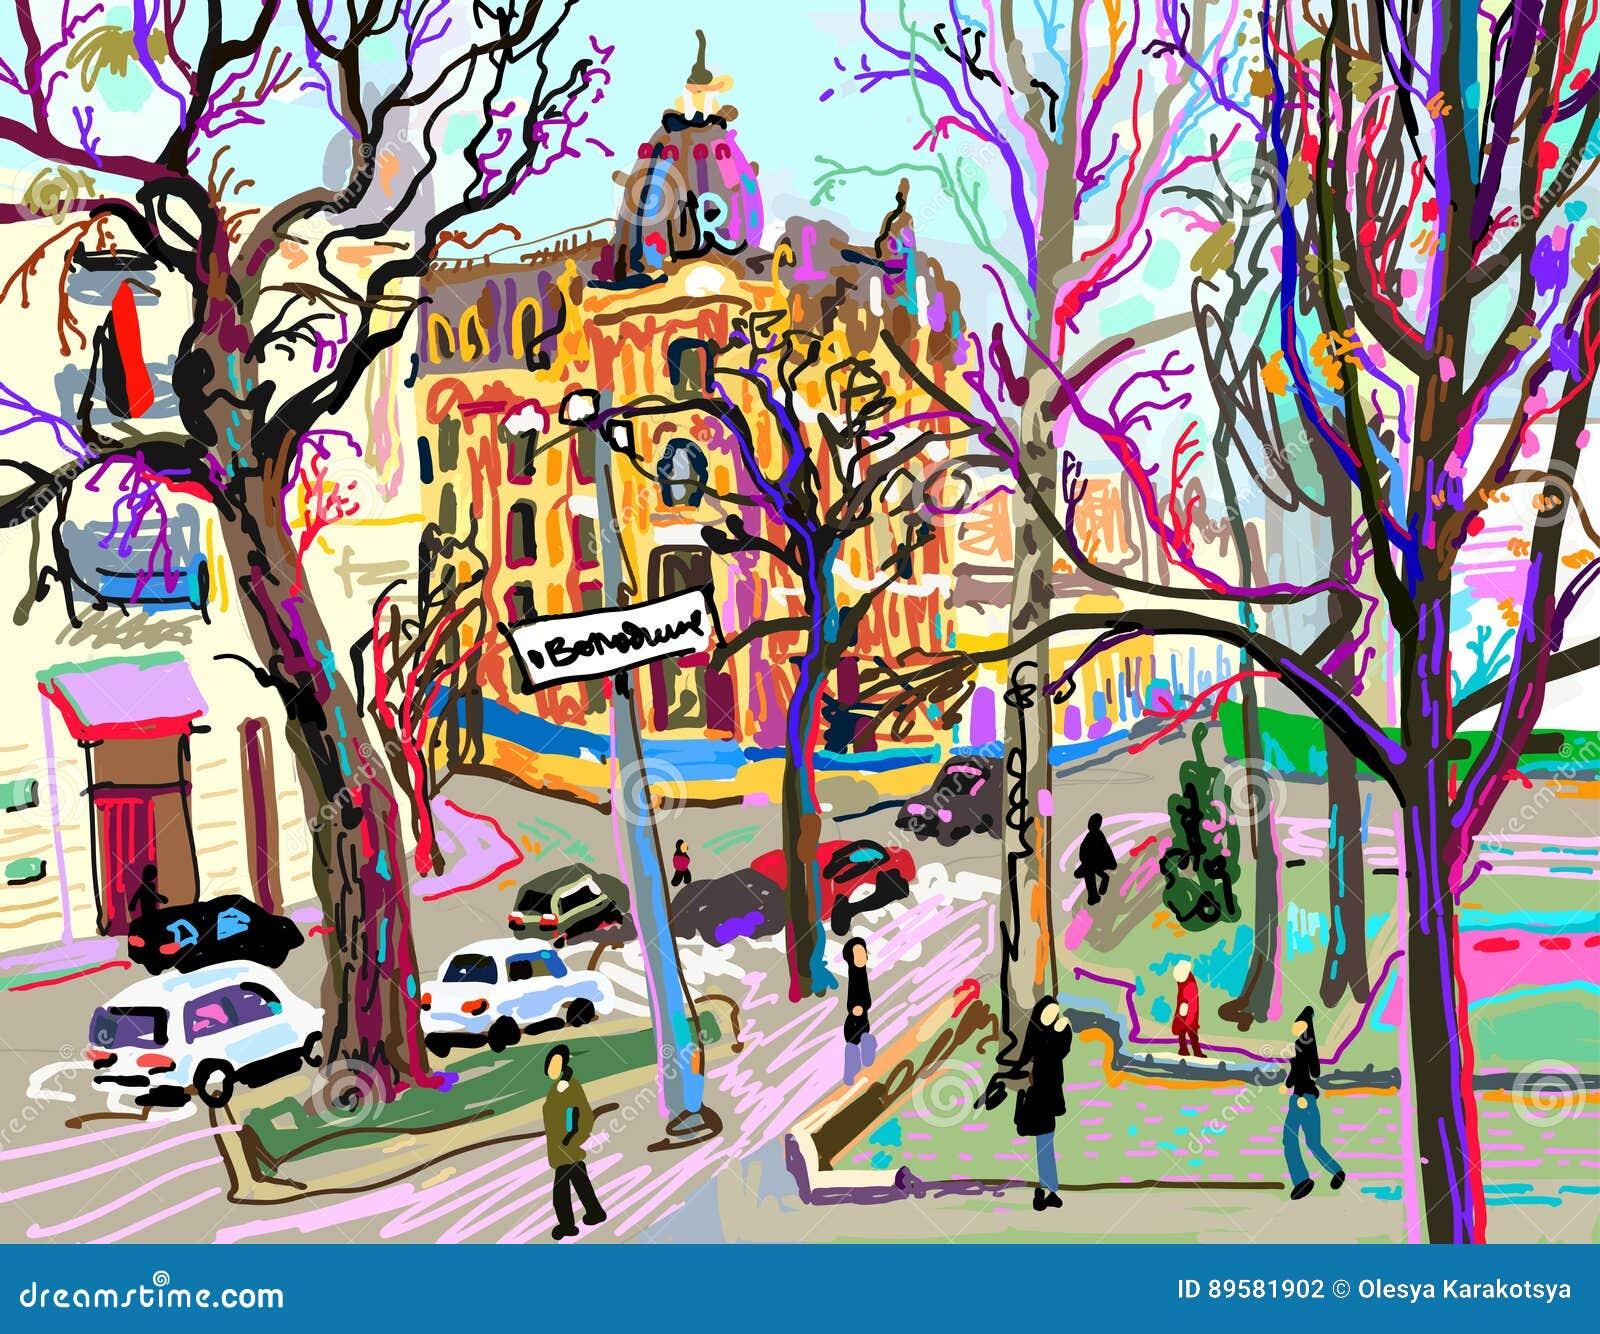 Digital plein air painting of Kiev street cityscape in spring